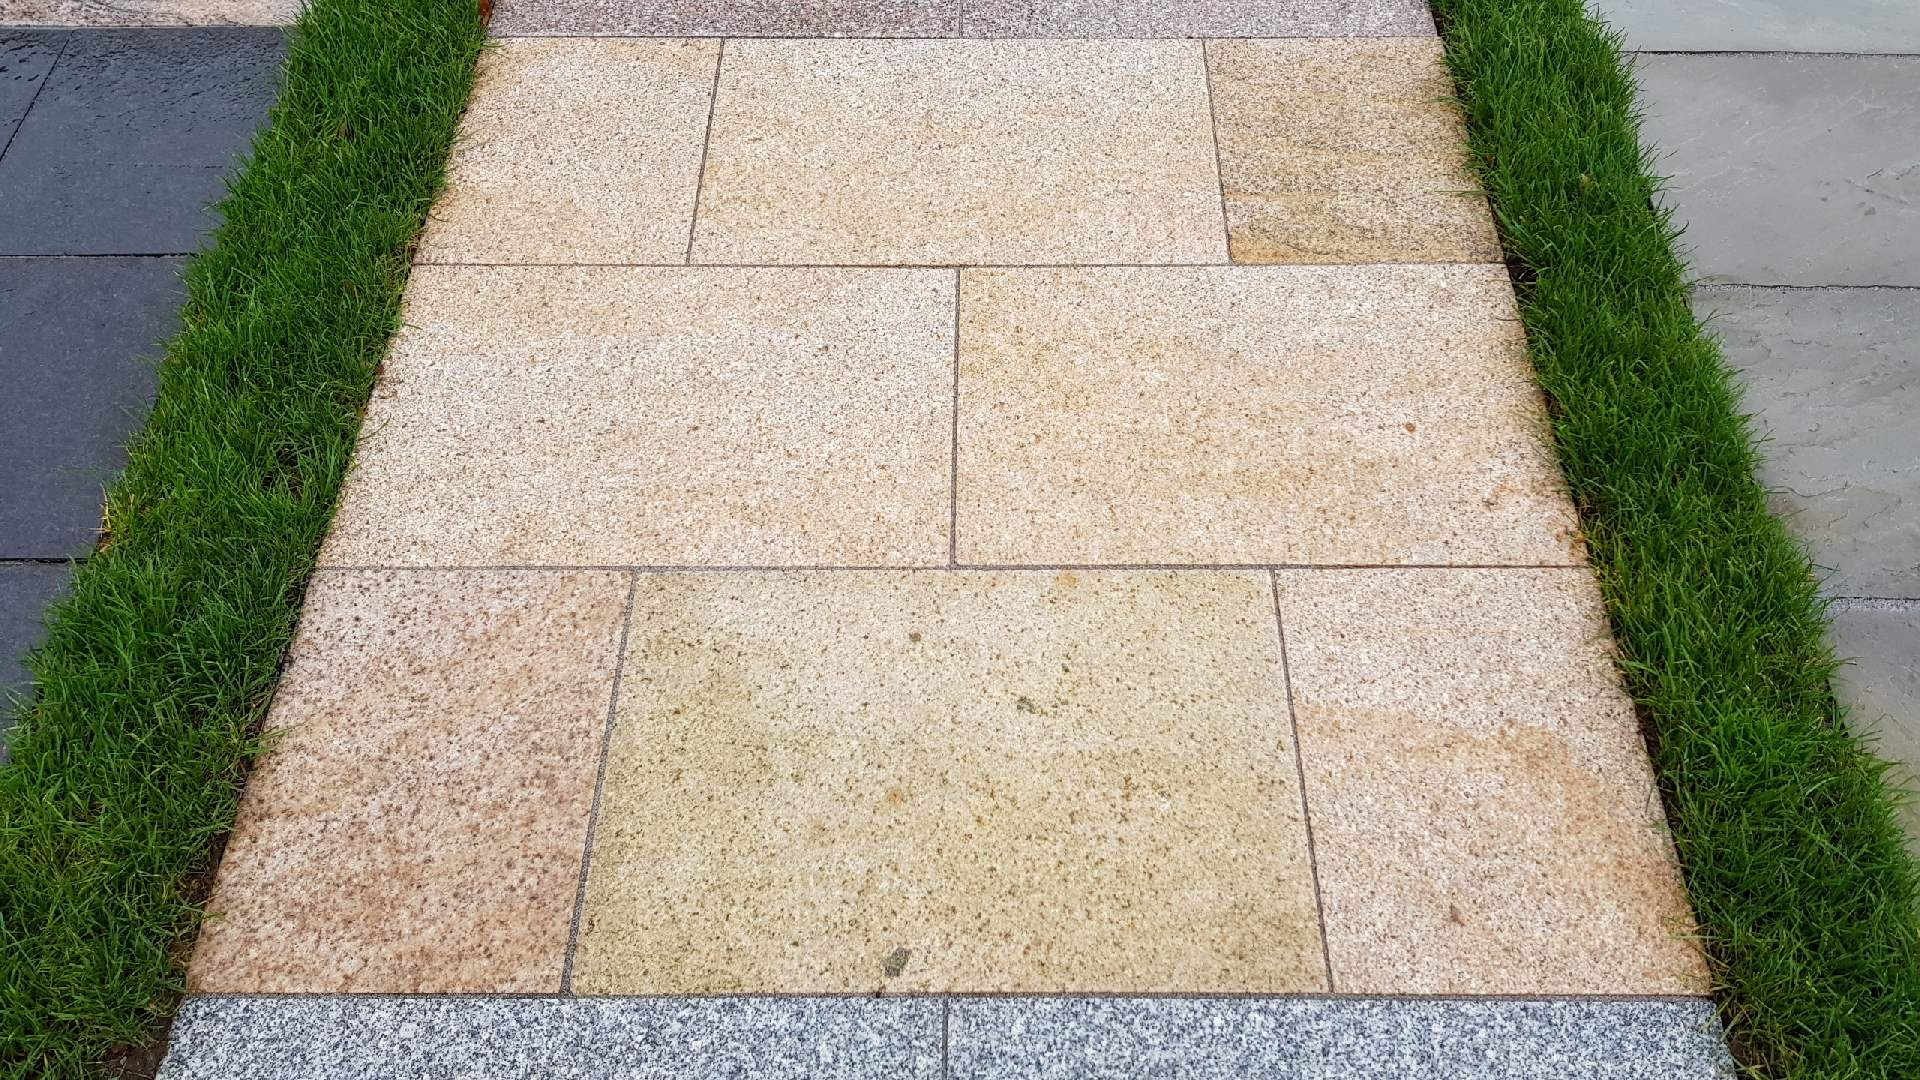 granitplatten terrassenplatten g nstiger ab hamurg kaufen. Black Bedroom Furniture Sets. Home Design Ideas